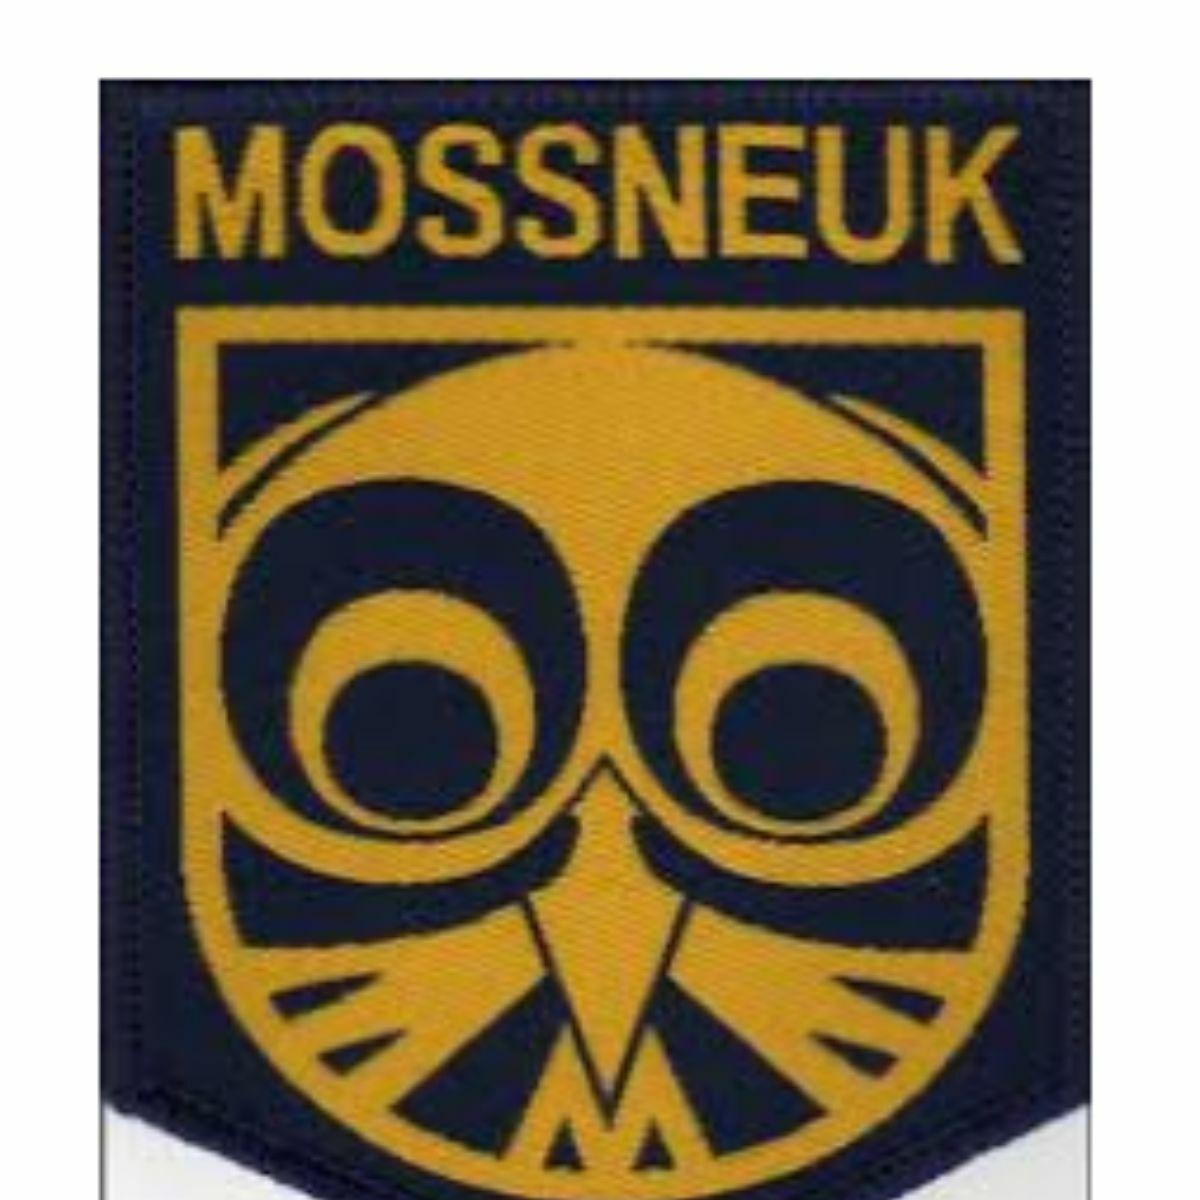 Mossneuk Primary School